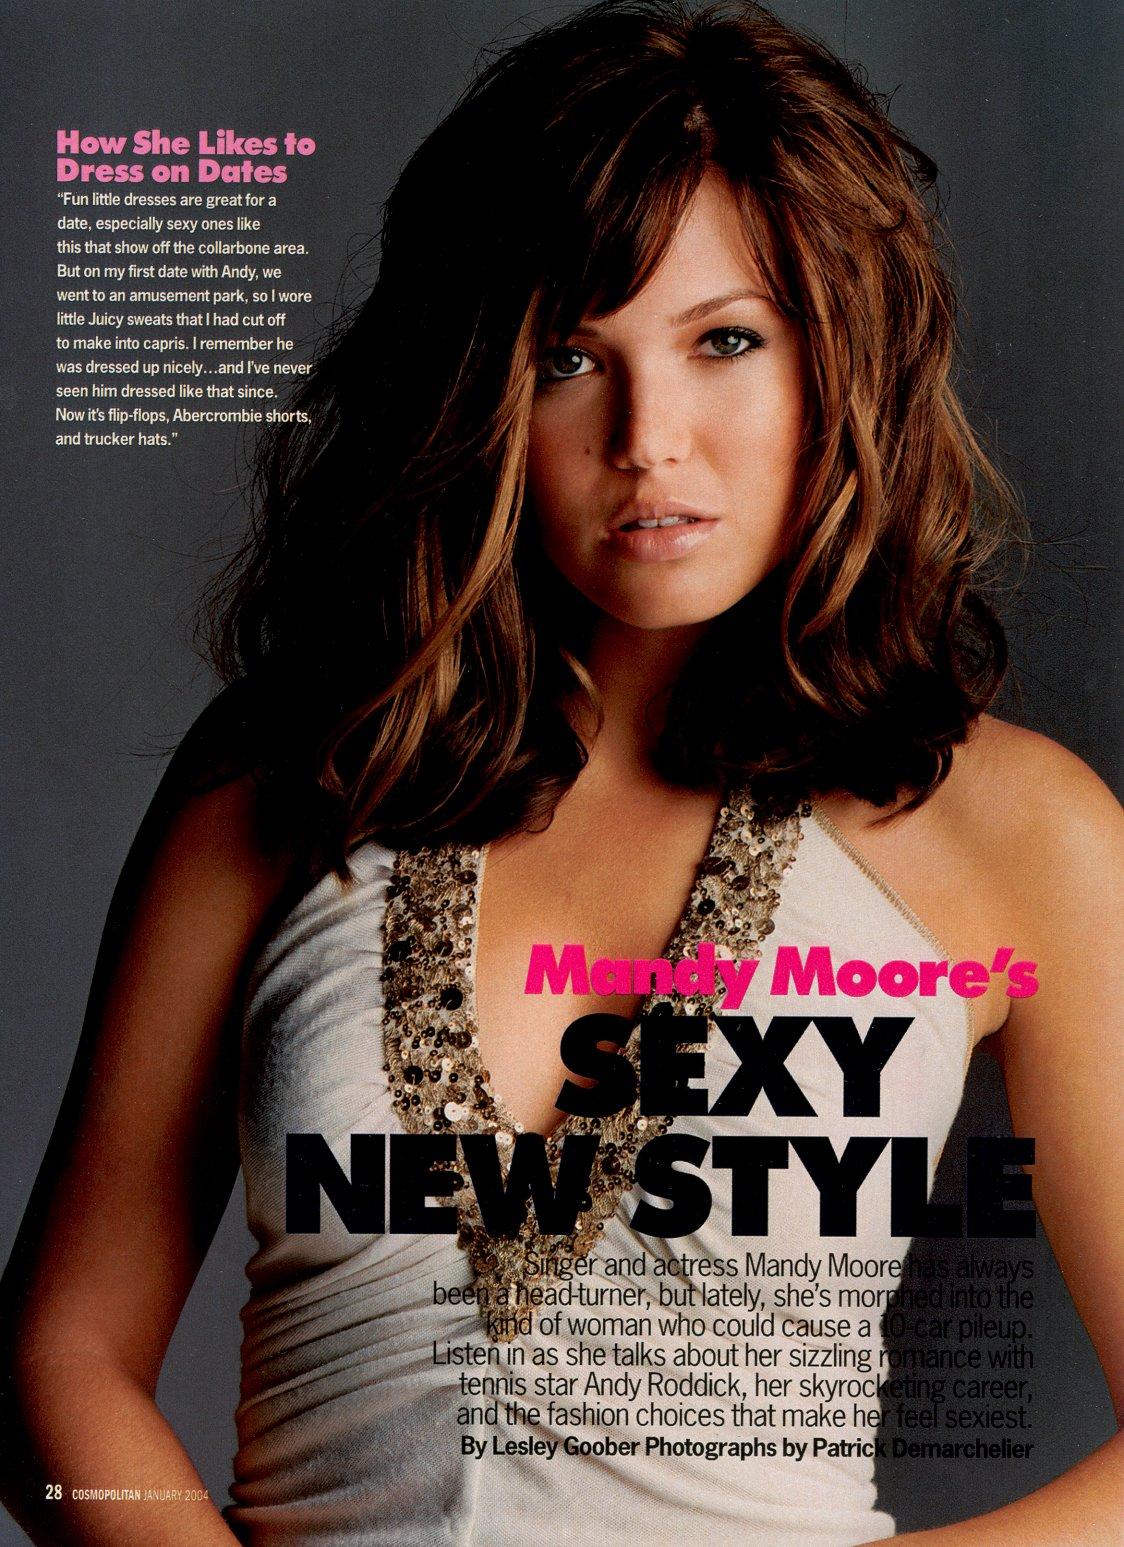 http://2.bp.blogspot.com/_GCAuqodmOE4/TRJnG-hc58I/AAAAAAAAF6I/iq3AWcisB9c/s1600/Sexiest+Mandy+Moore++%25284%2529.jpg